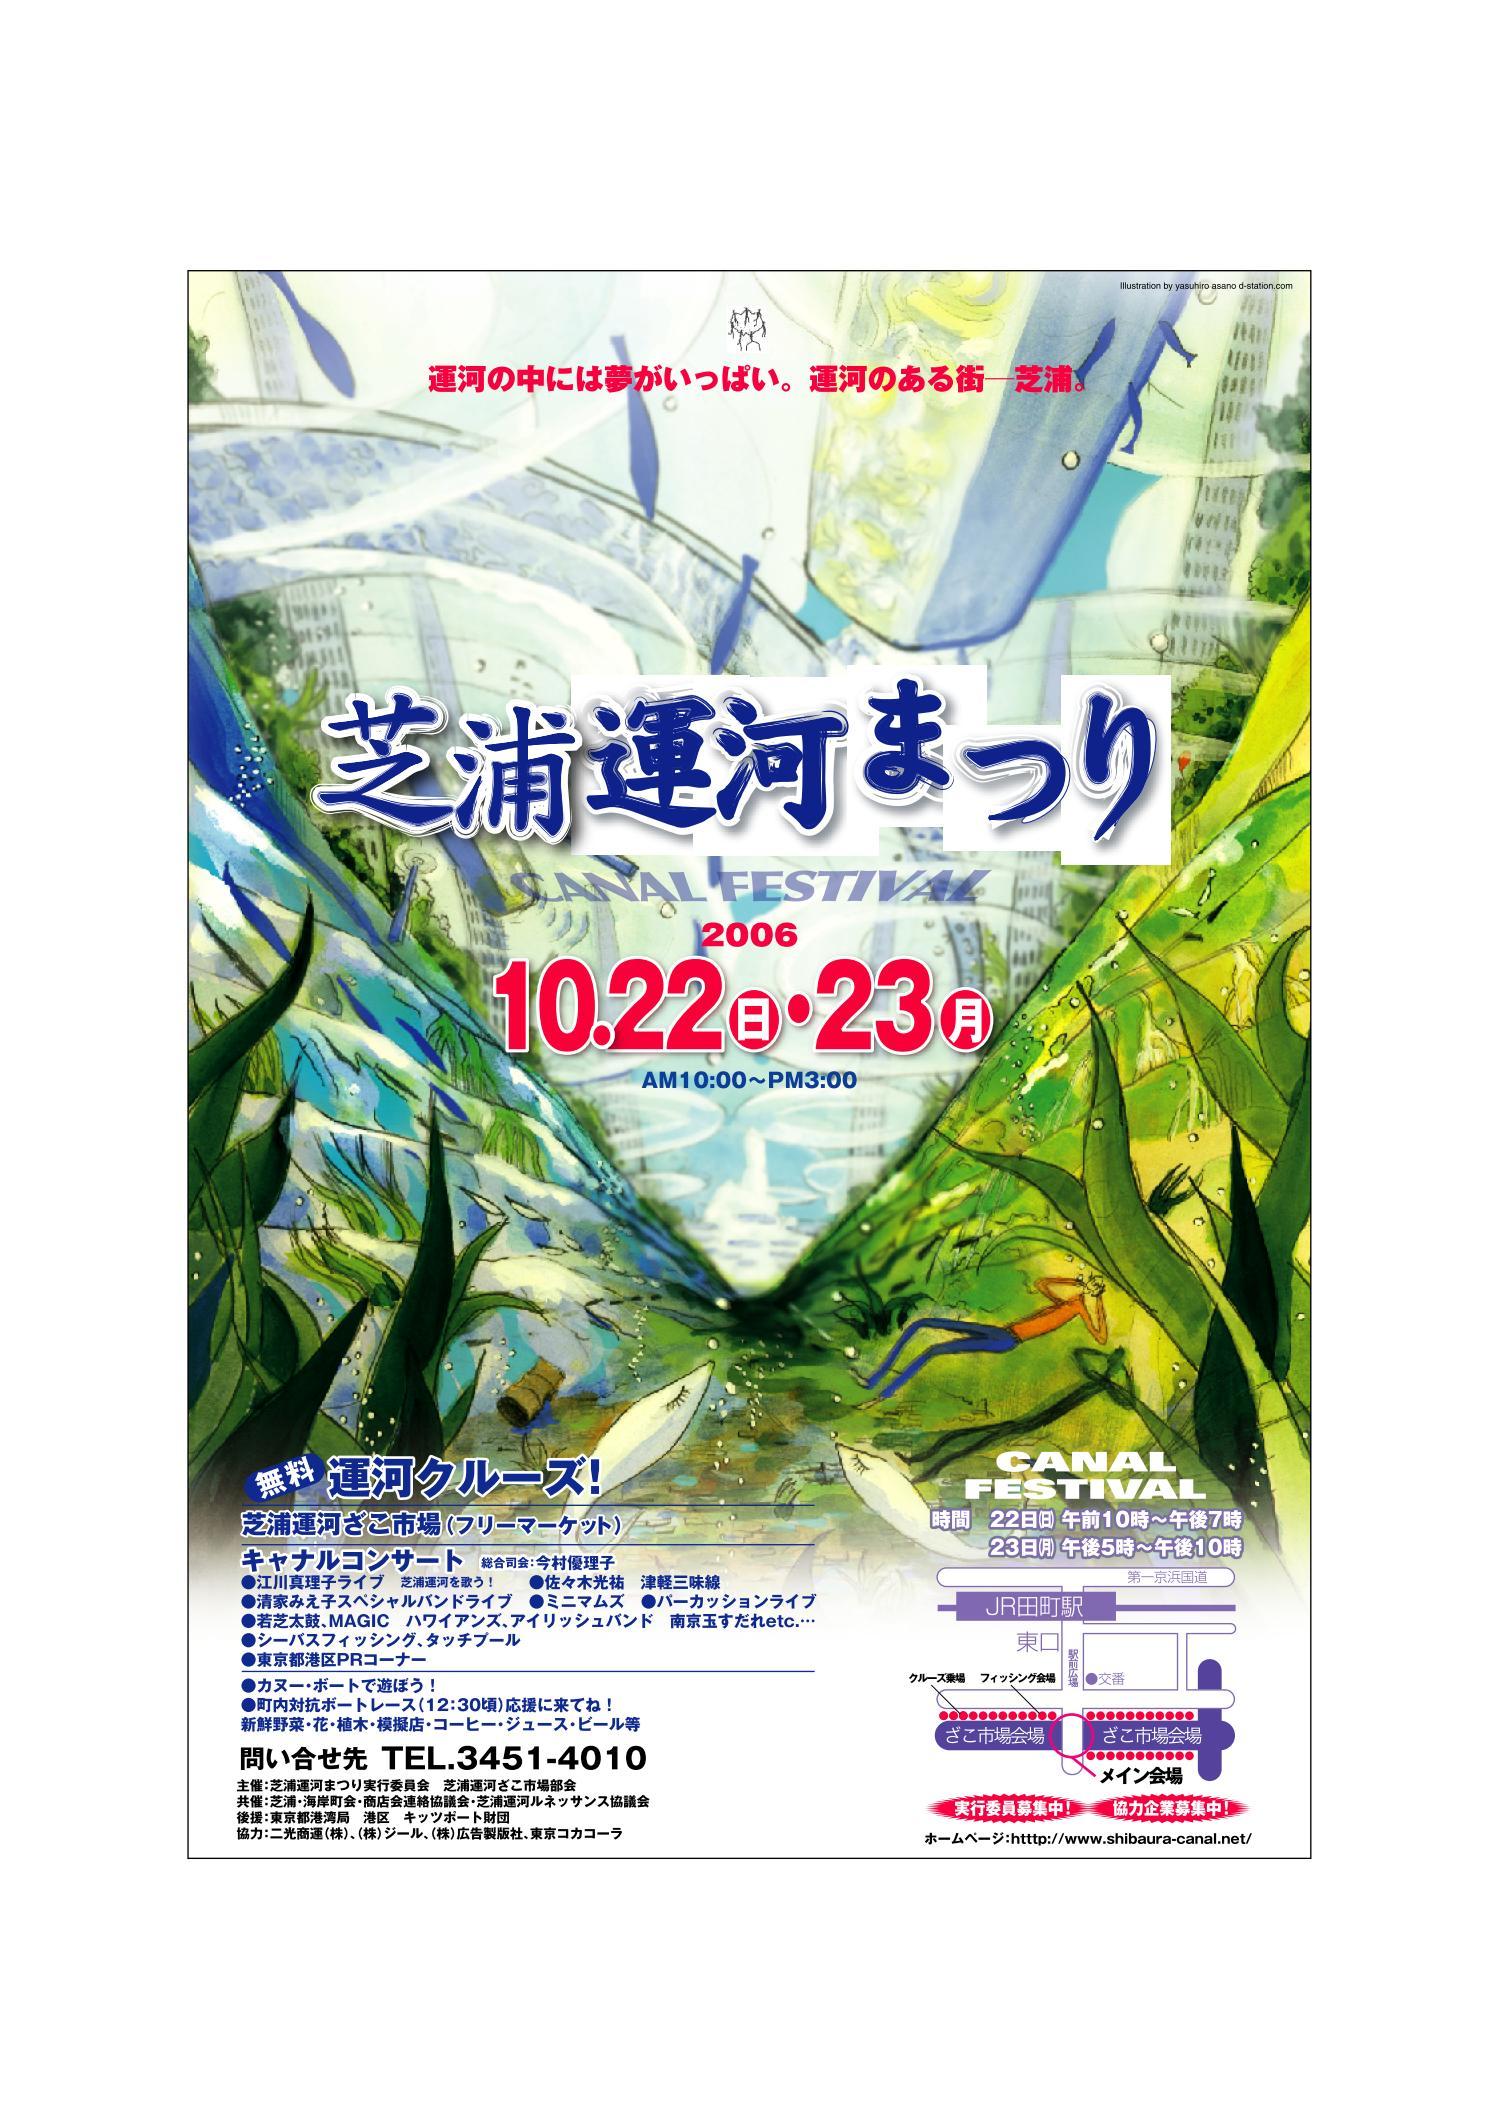 unga2006_poster